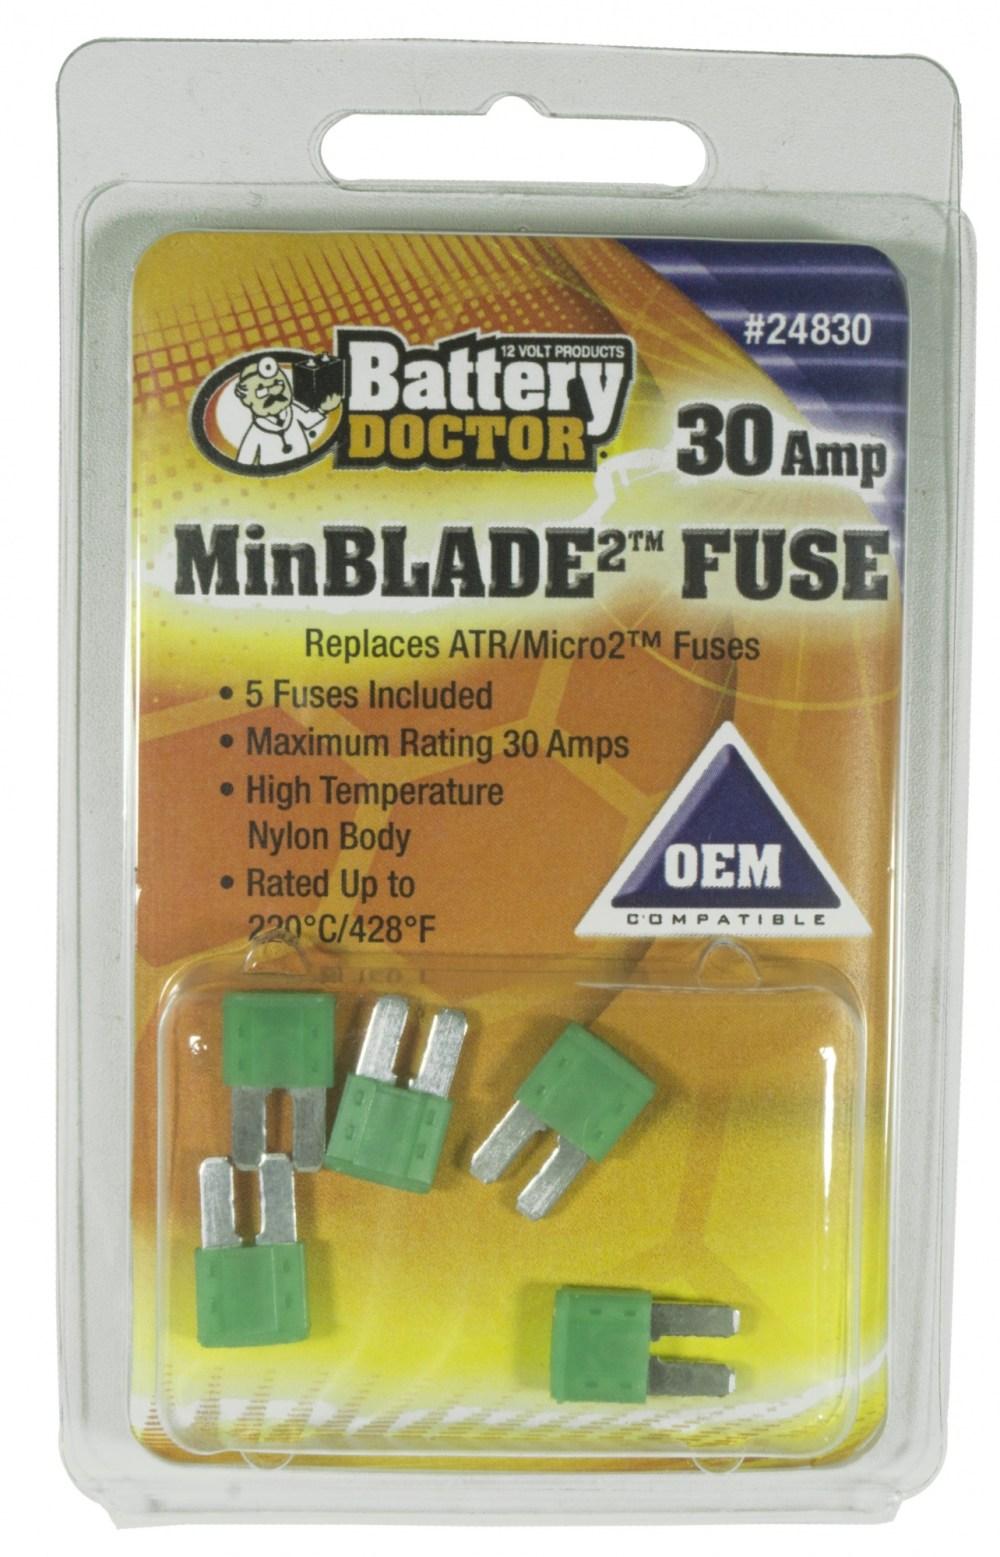 medium resolution of 30 amp minblade2 fuse 5 retail 24830